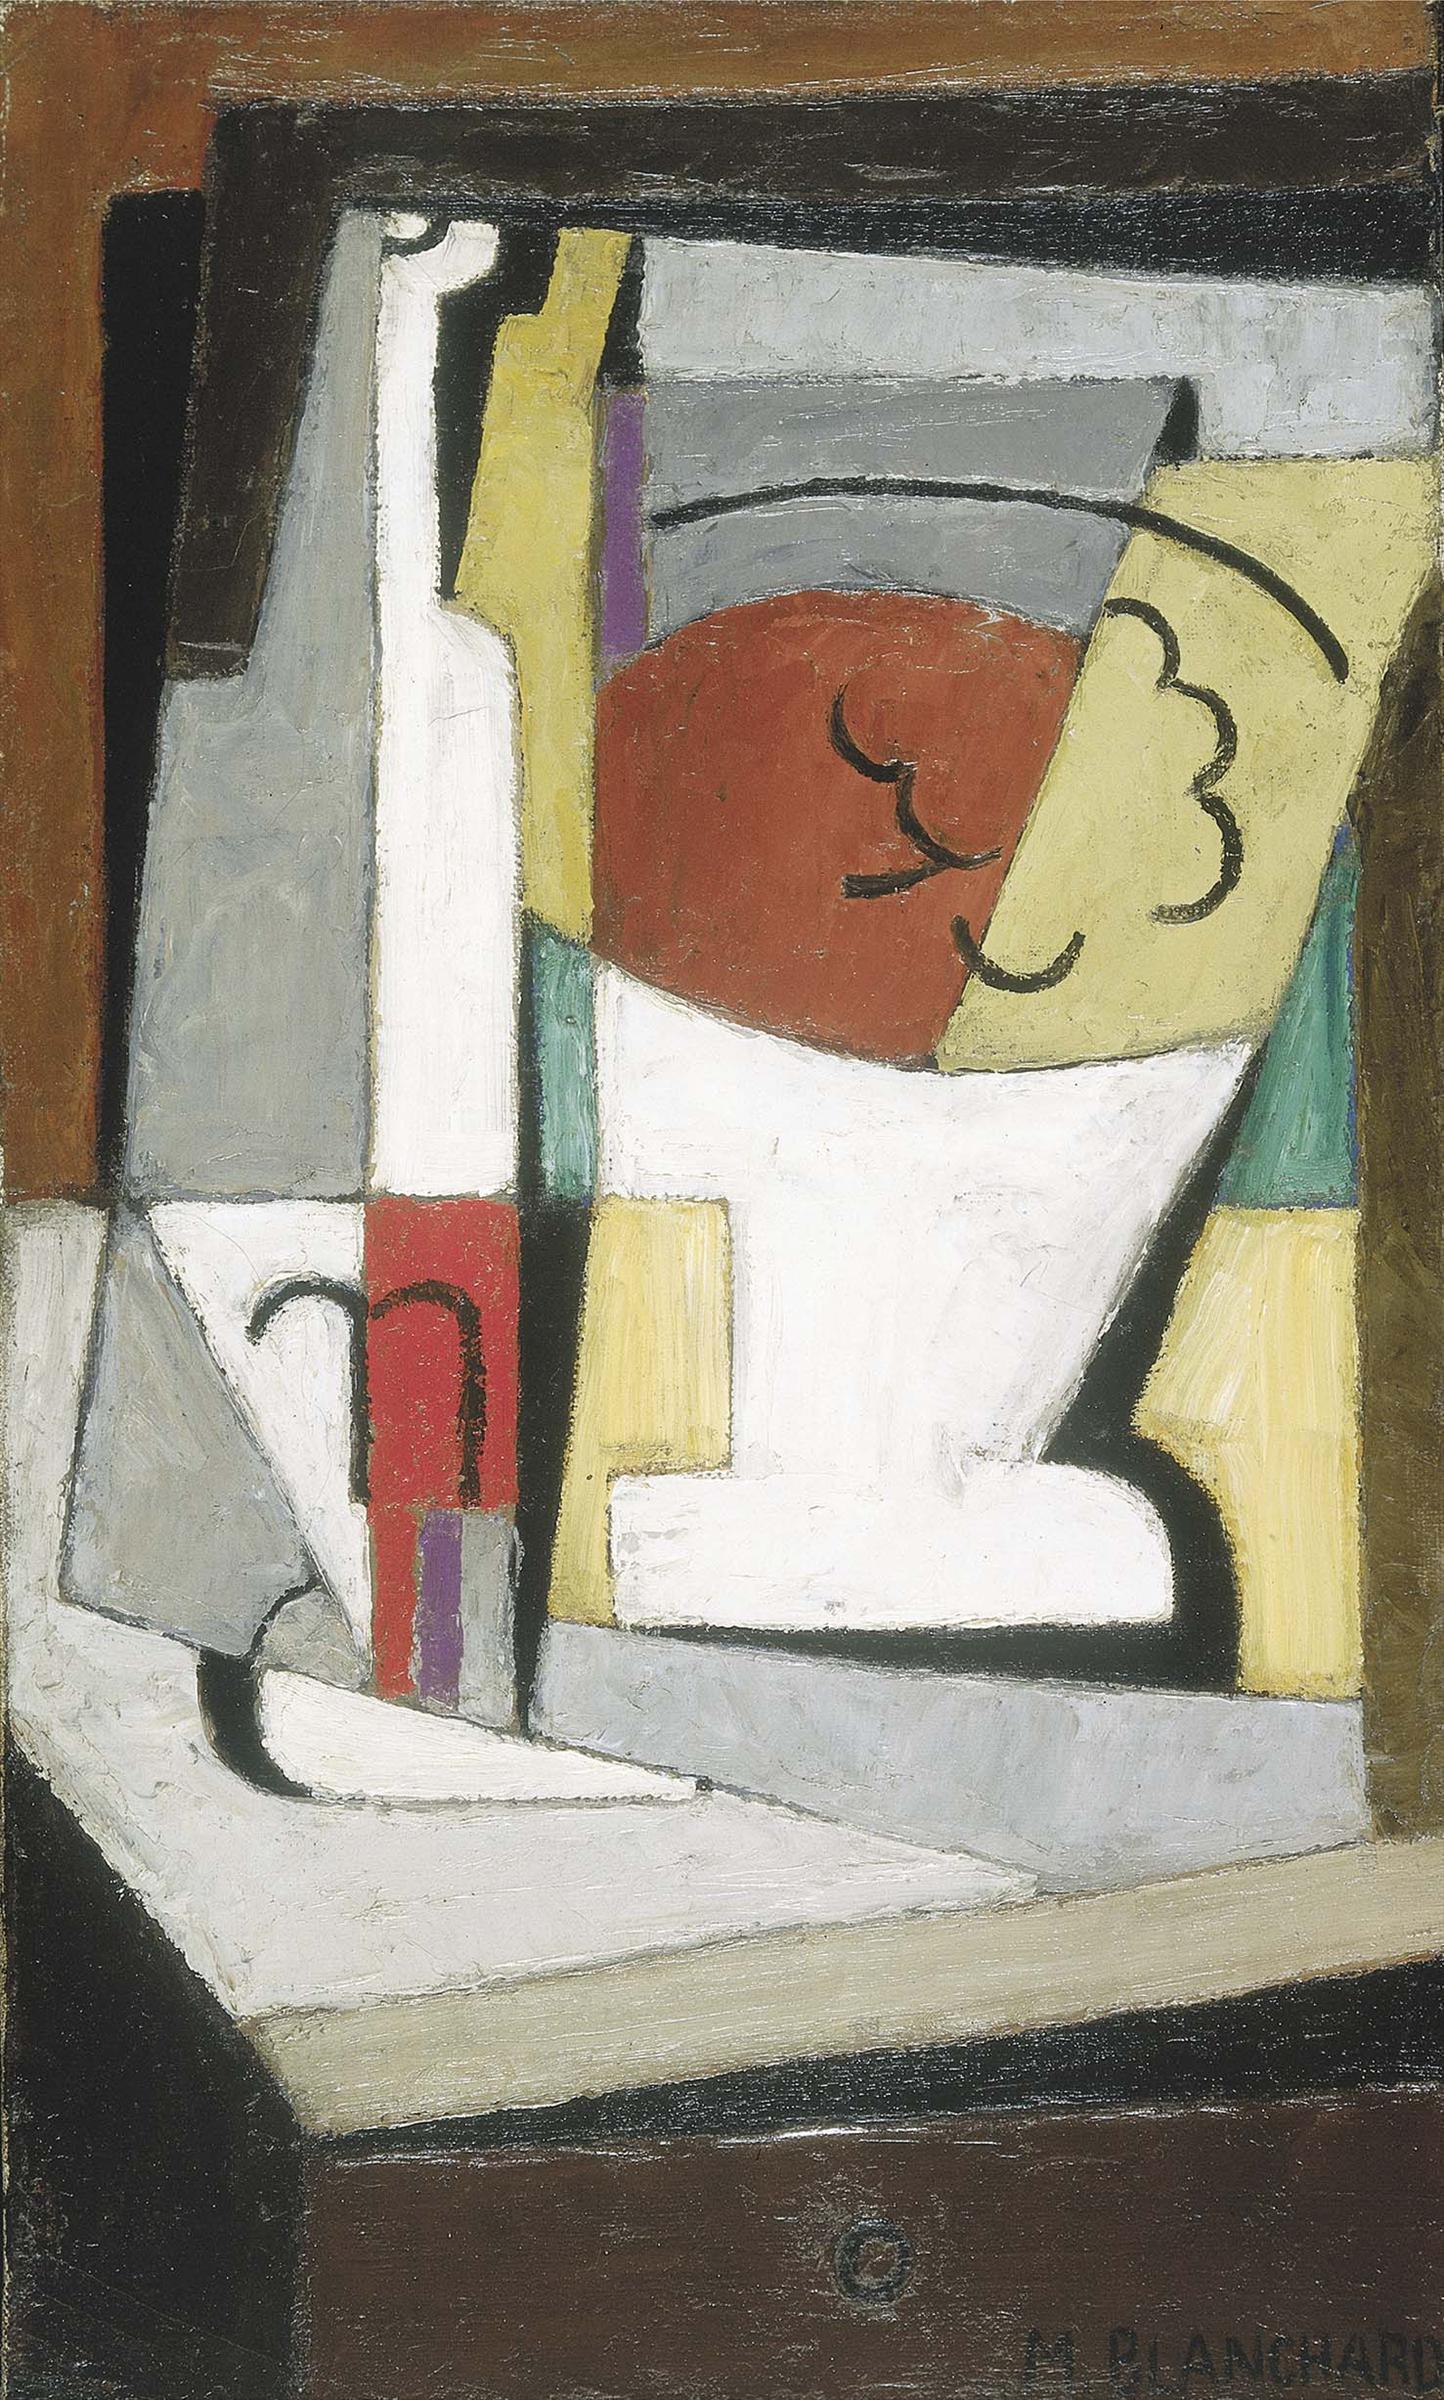 Long Term Loan >> María Blanchard (María Gutiérrez Blanchard) - Nature morte cubiste (Cubist Still Life)